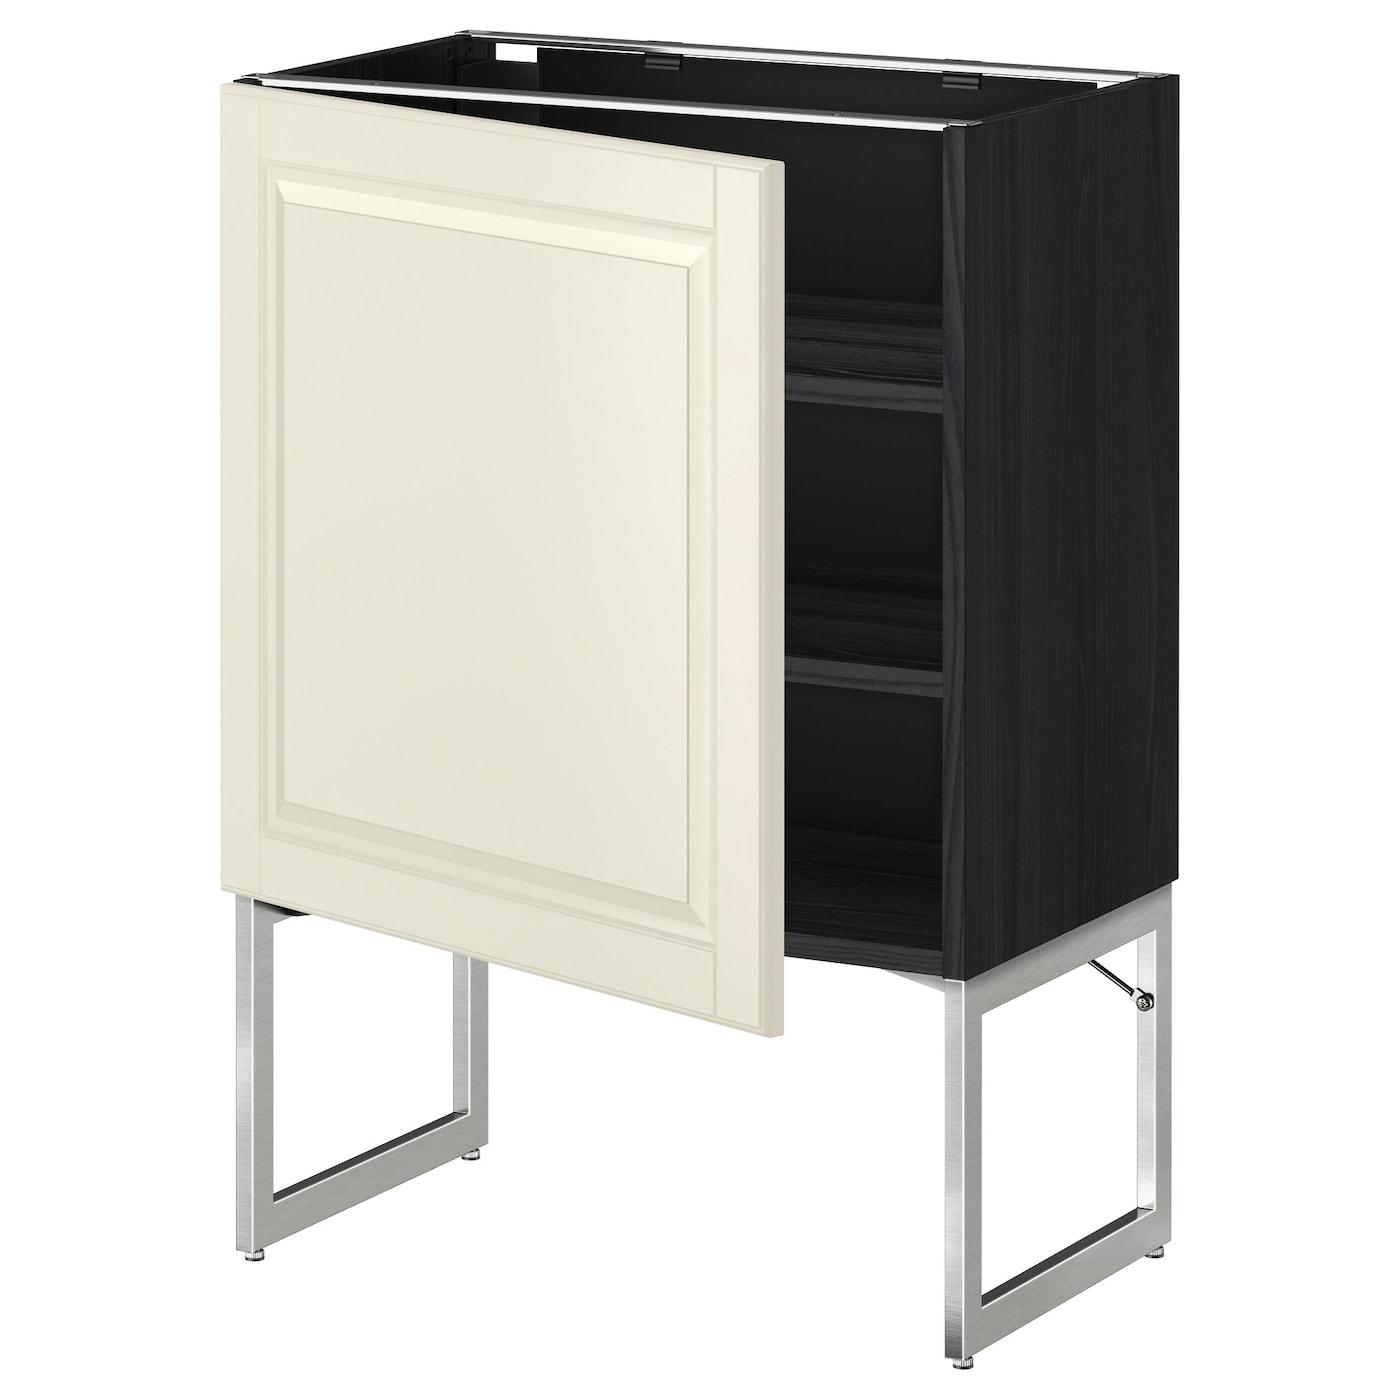 metod base cabinet with shelves black bodbyn off white 60x37x60 cm ikea. Black Bedroom Furniture Sets. Home Design Ideas